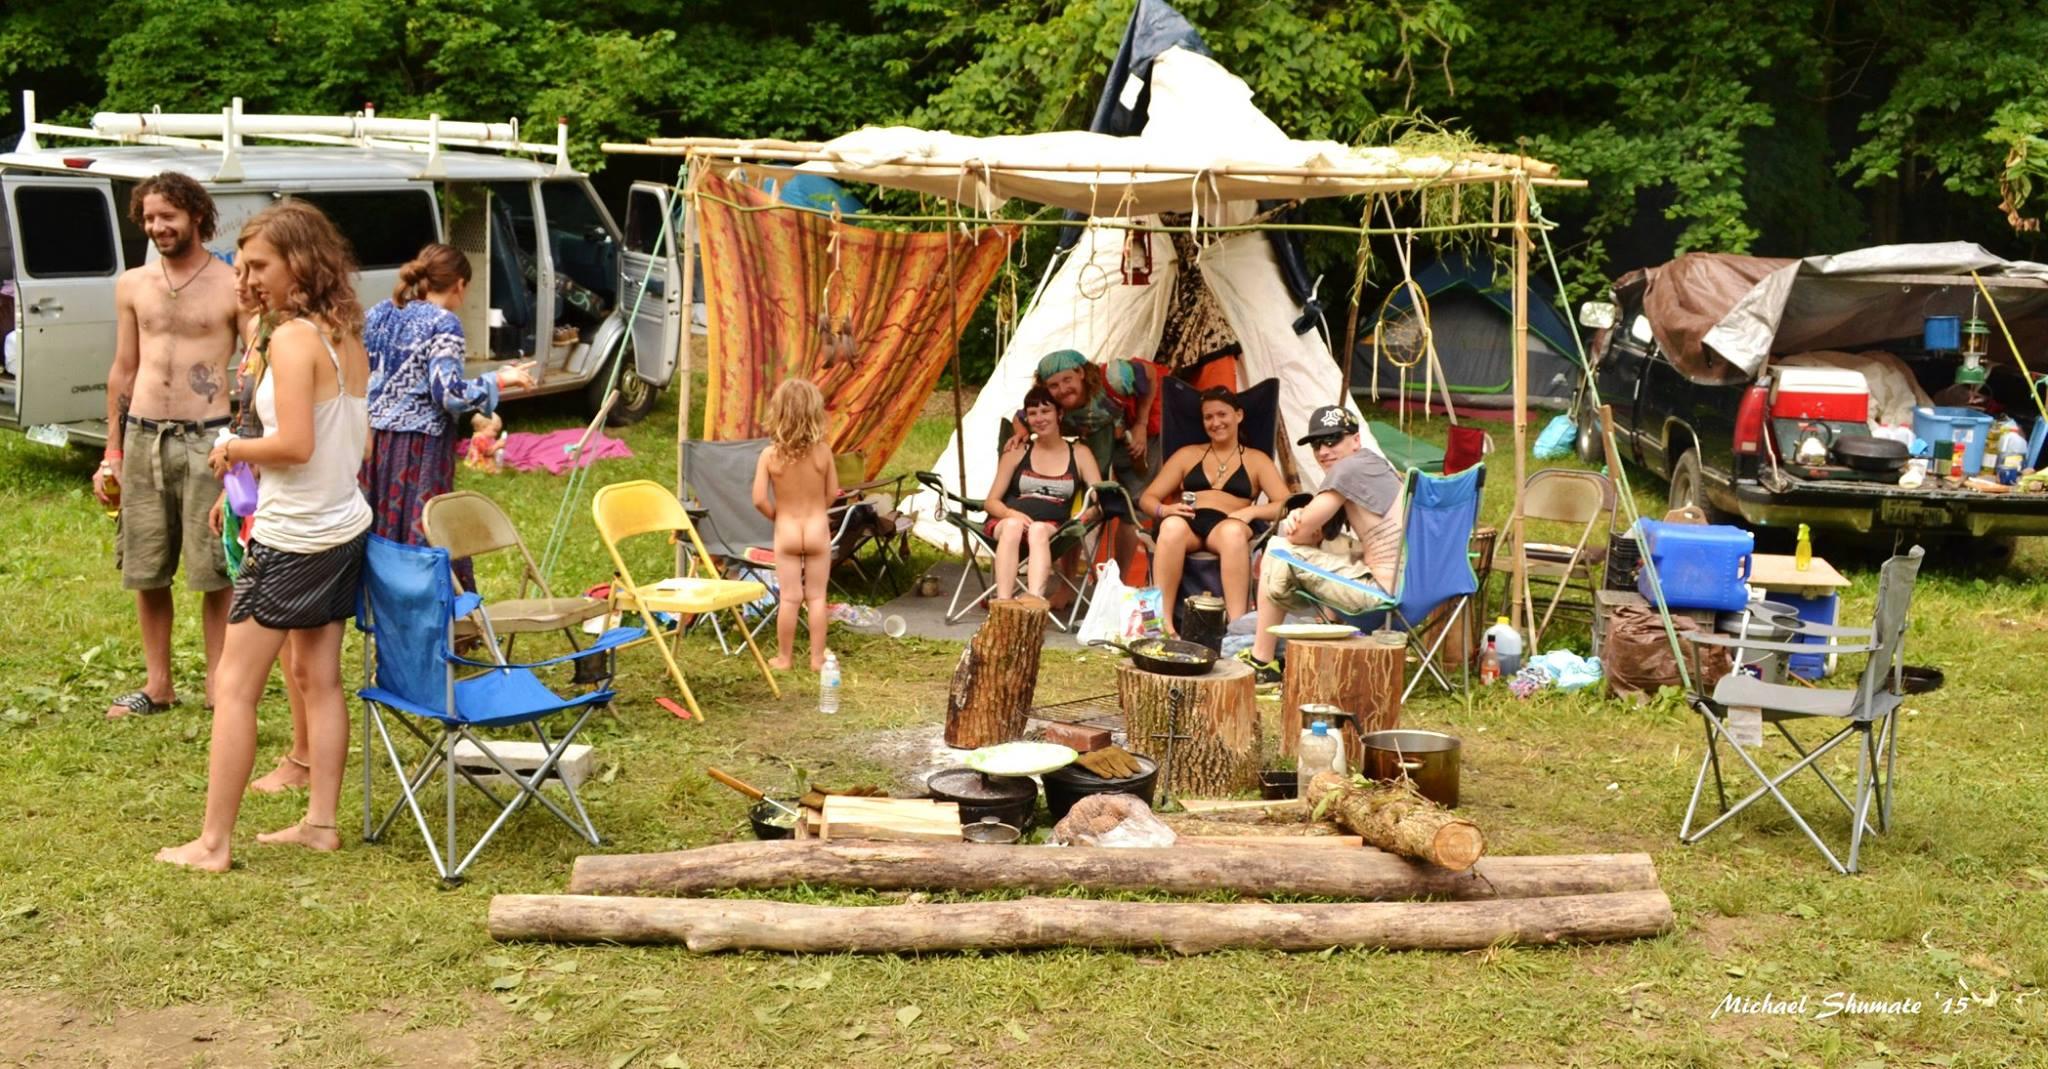 hippies, camping, butt, music festival